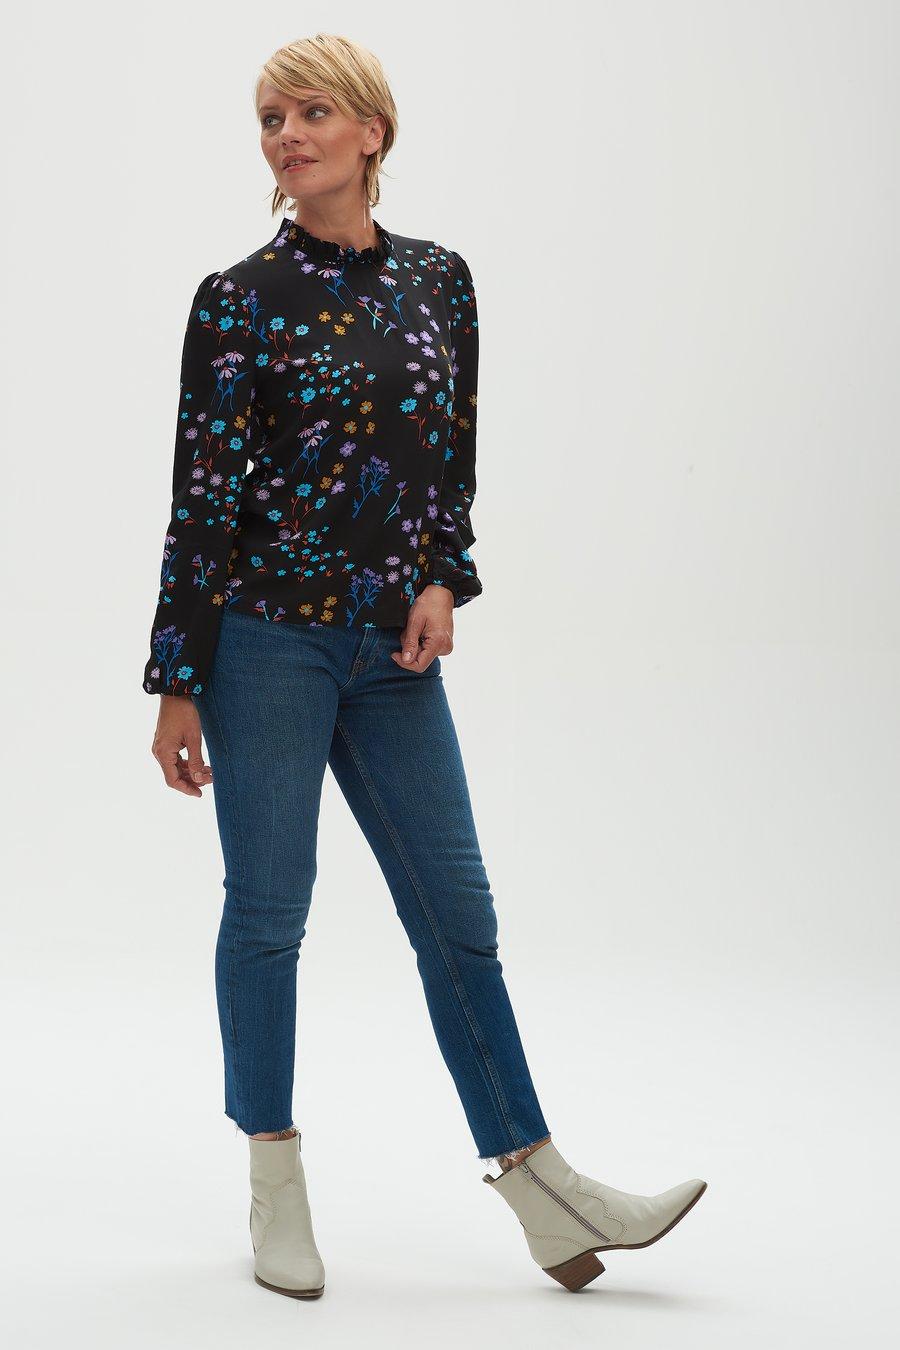 SUGARHILL-BRIGHTON-MAYBELL-FRILL-NECK-BLOUSE-Shirt-black-wild-floral-3